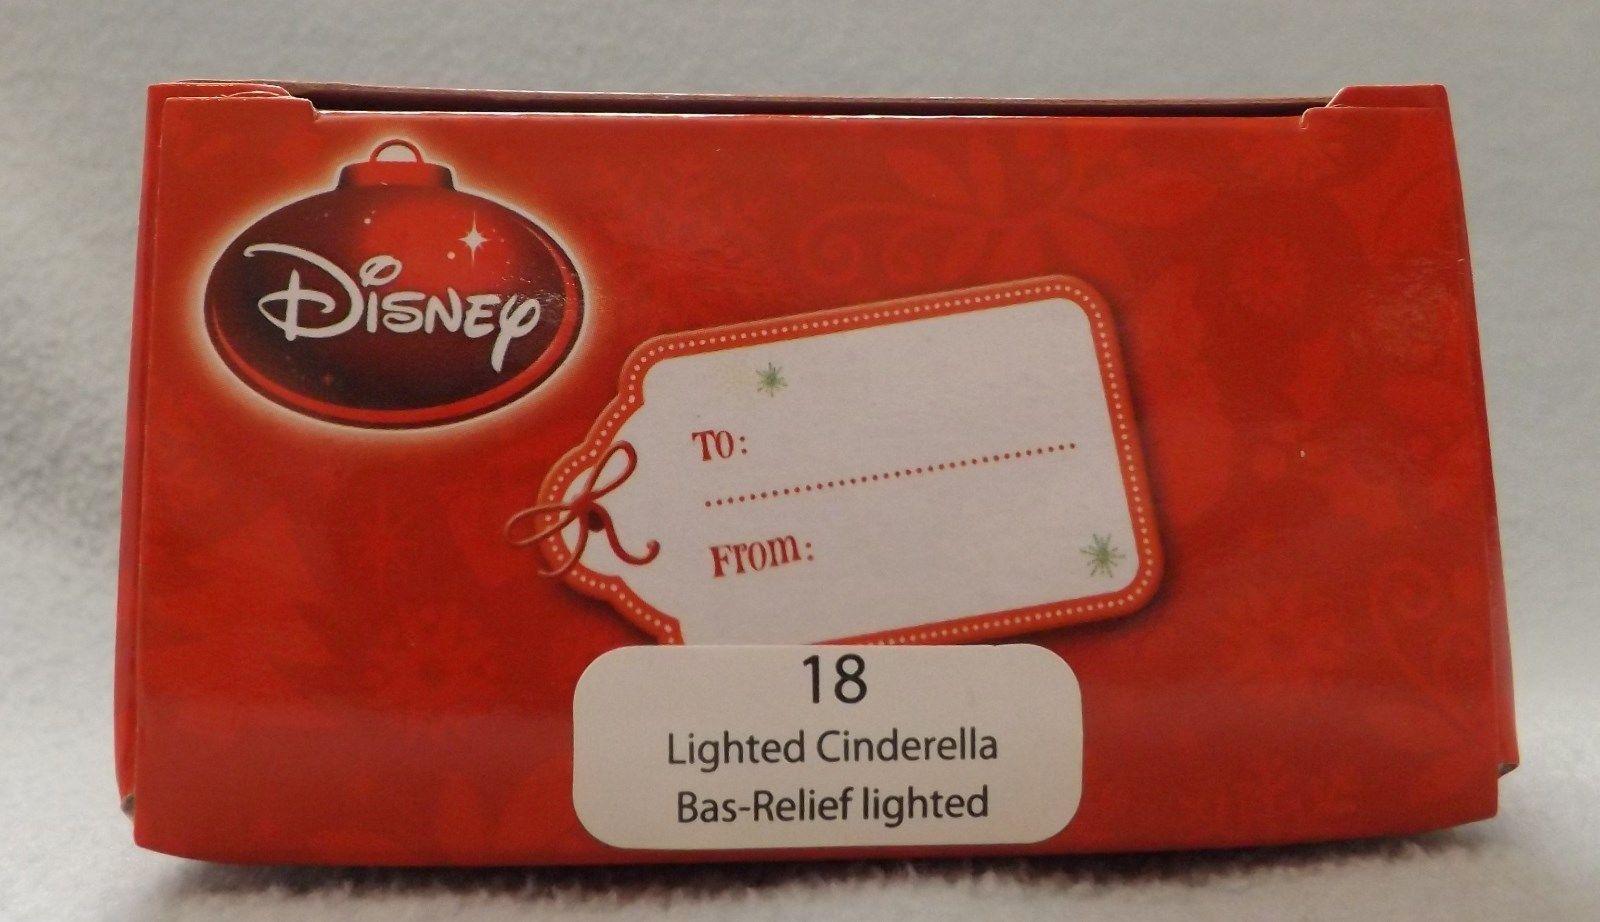 "Disney 3"" Lighted Cinderella Bas-Relief Ornament image 2"